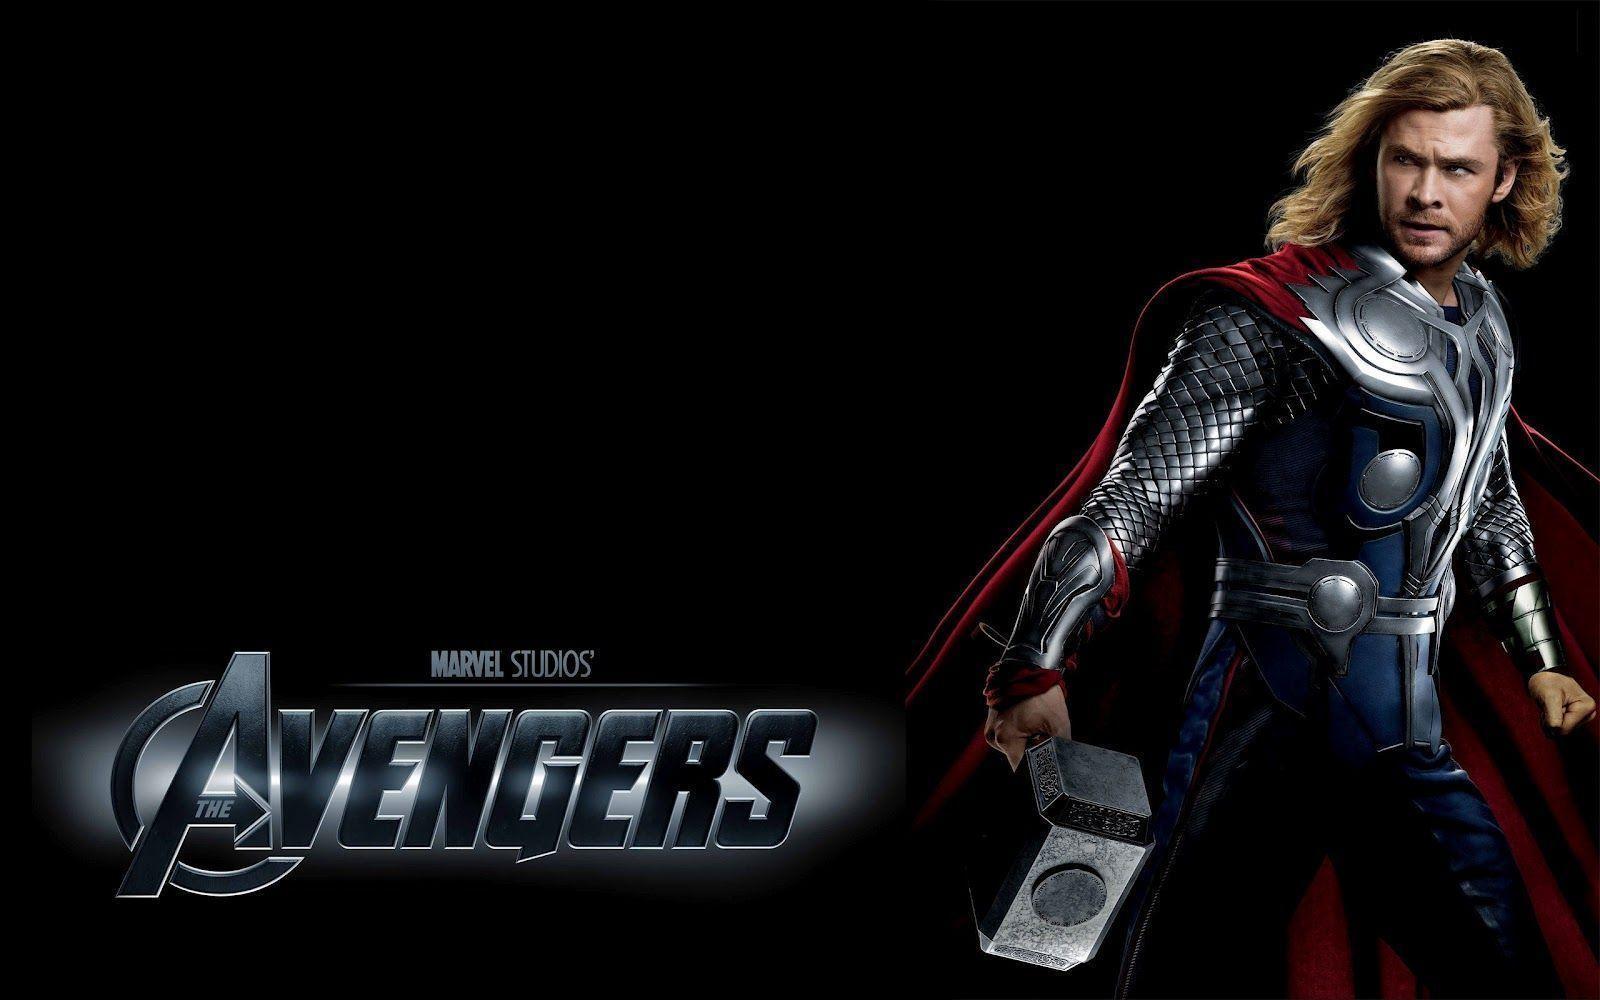 Wallpapers For > Avengers Wallpaper Hd Iron Man